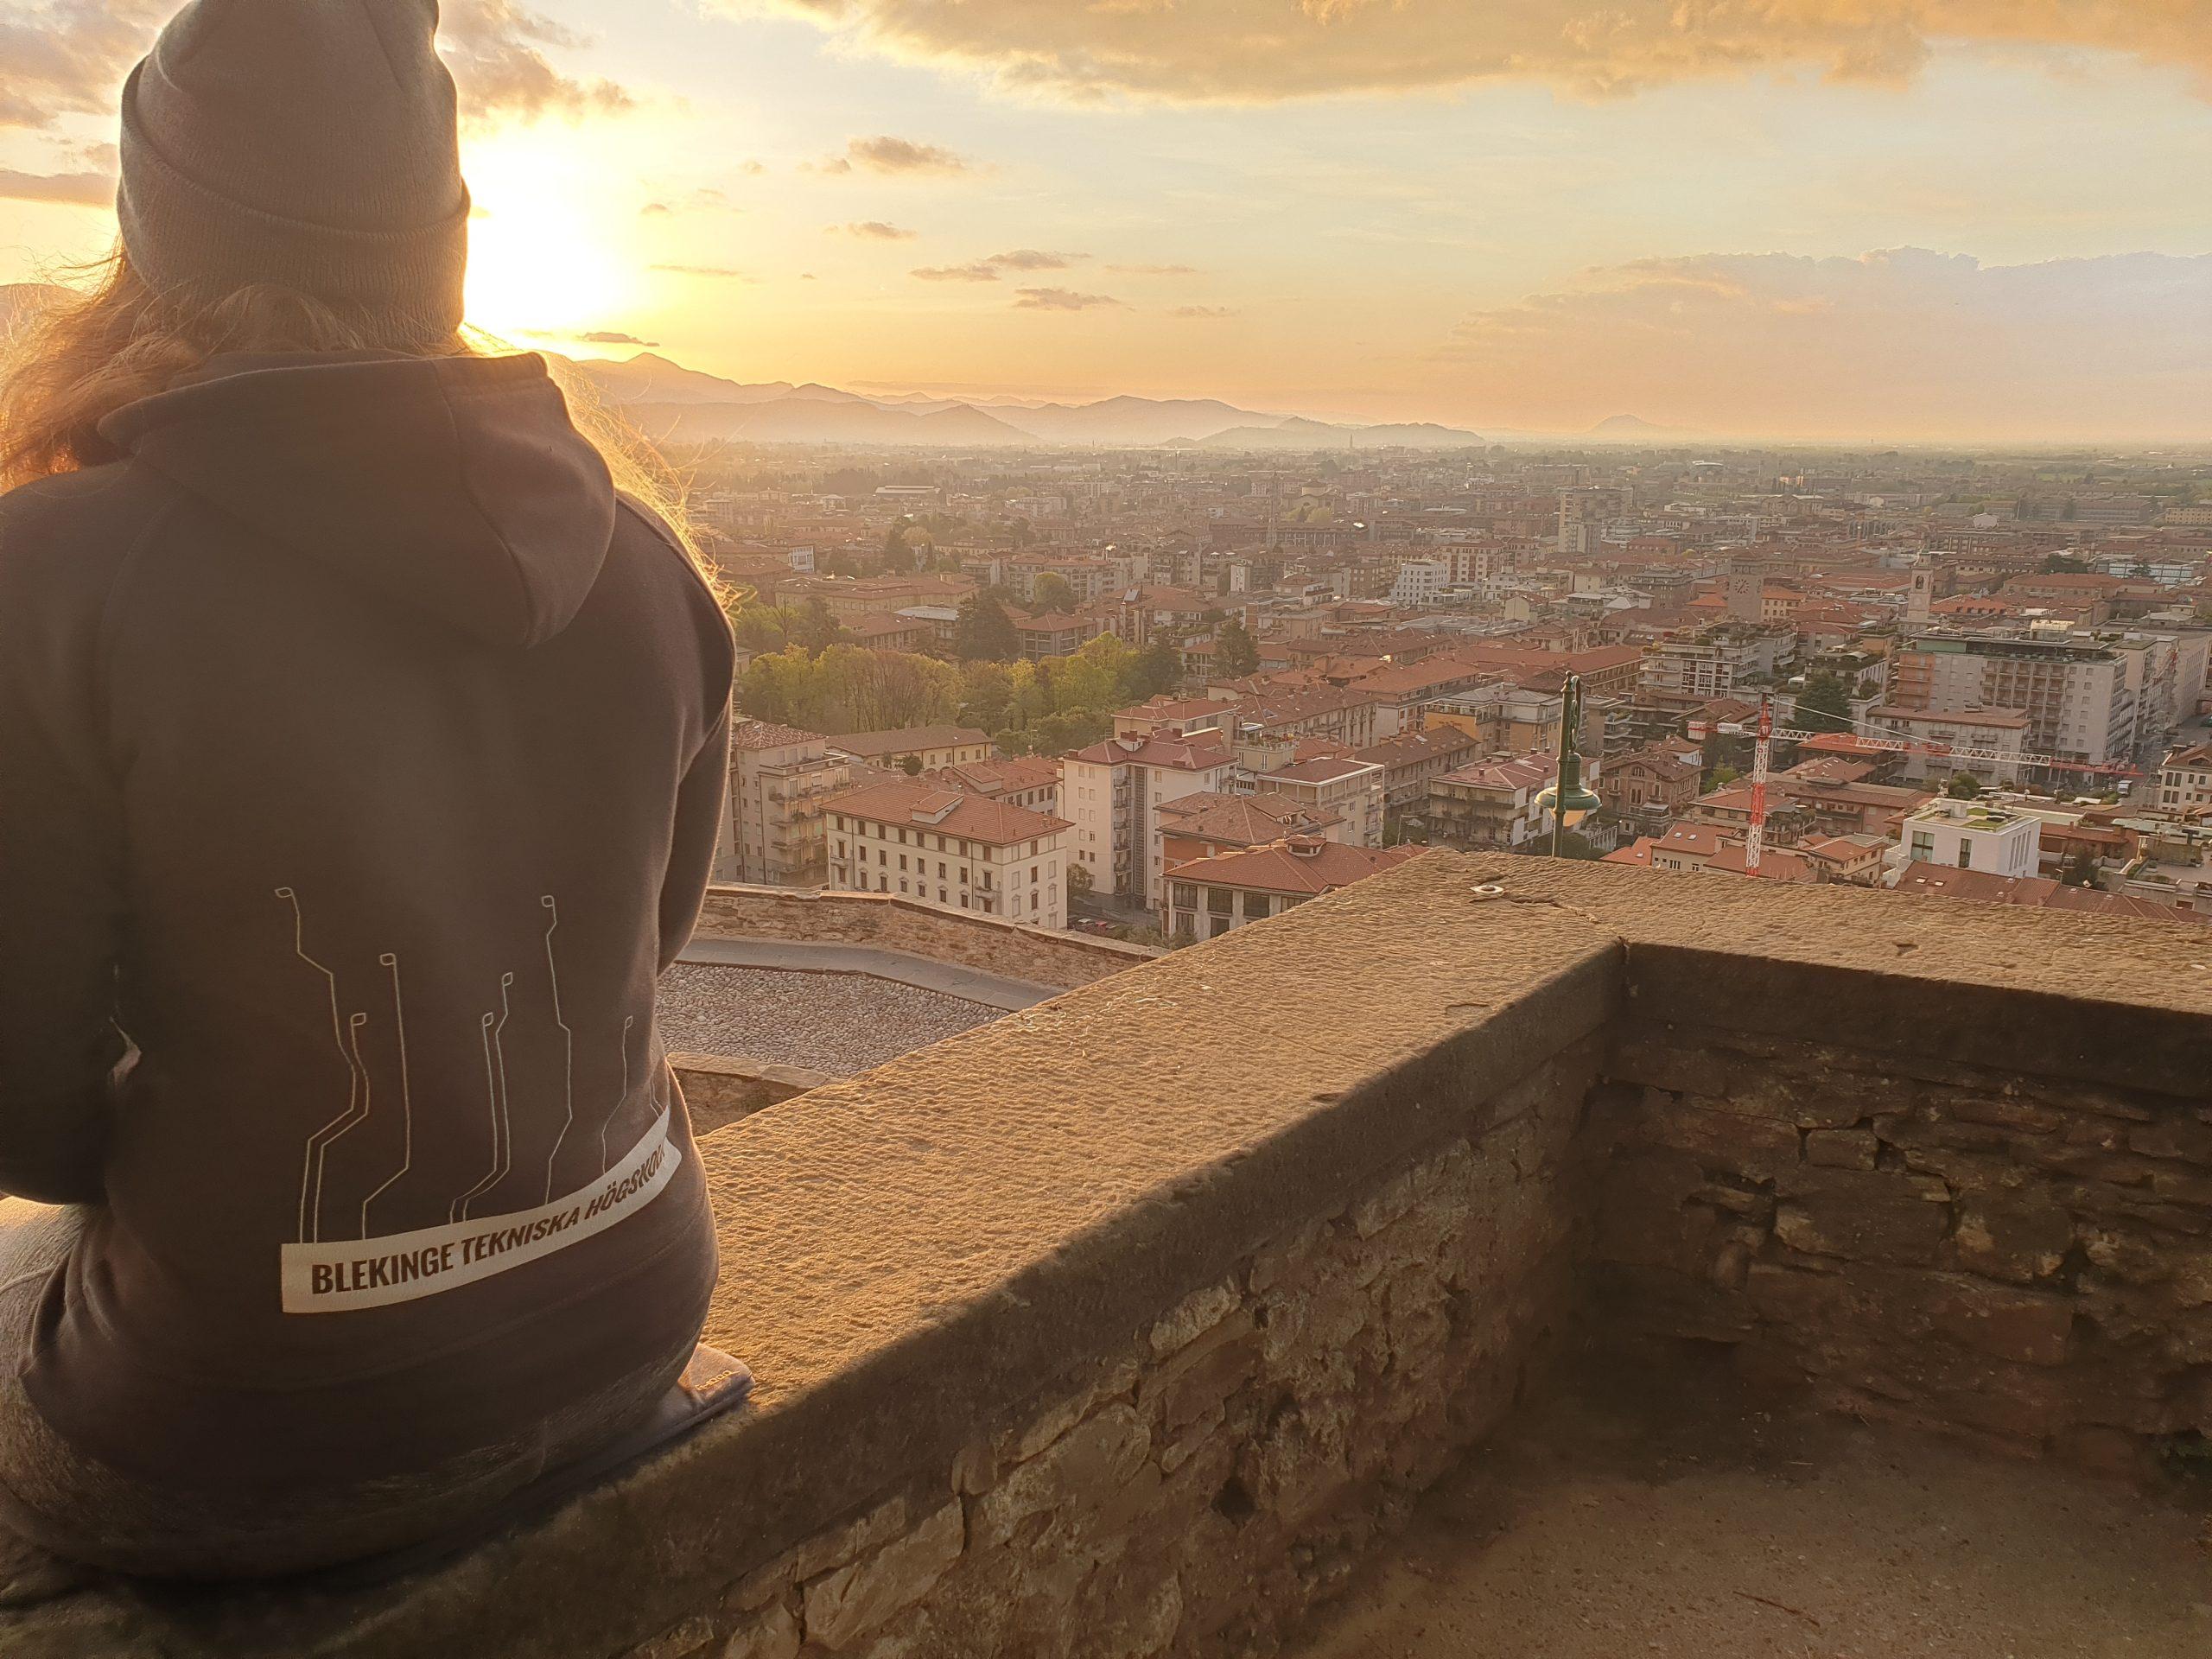 Soluppgång över Bergamo